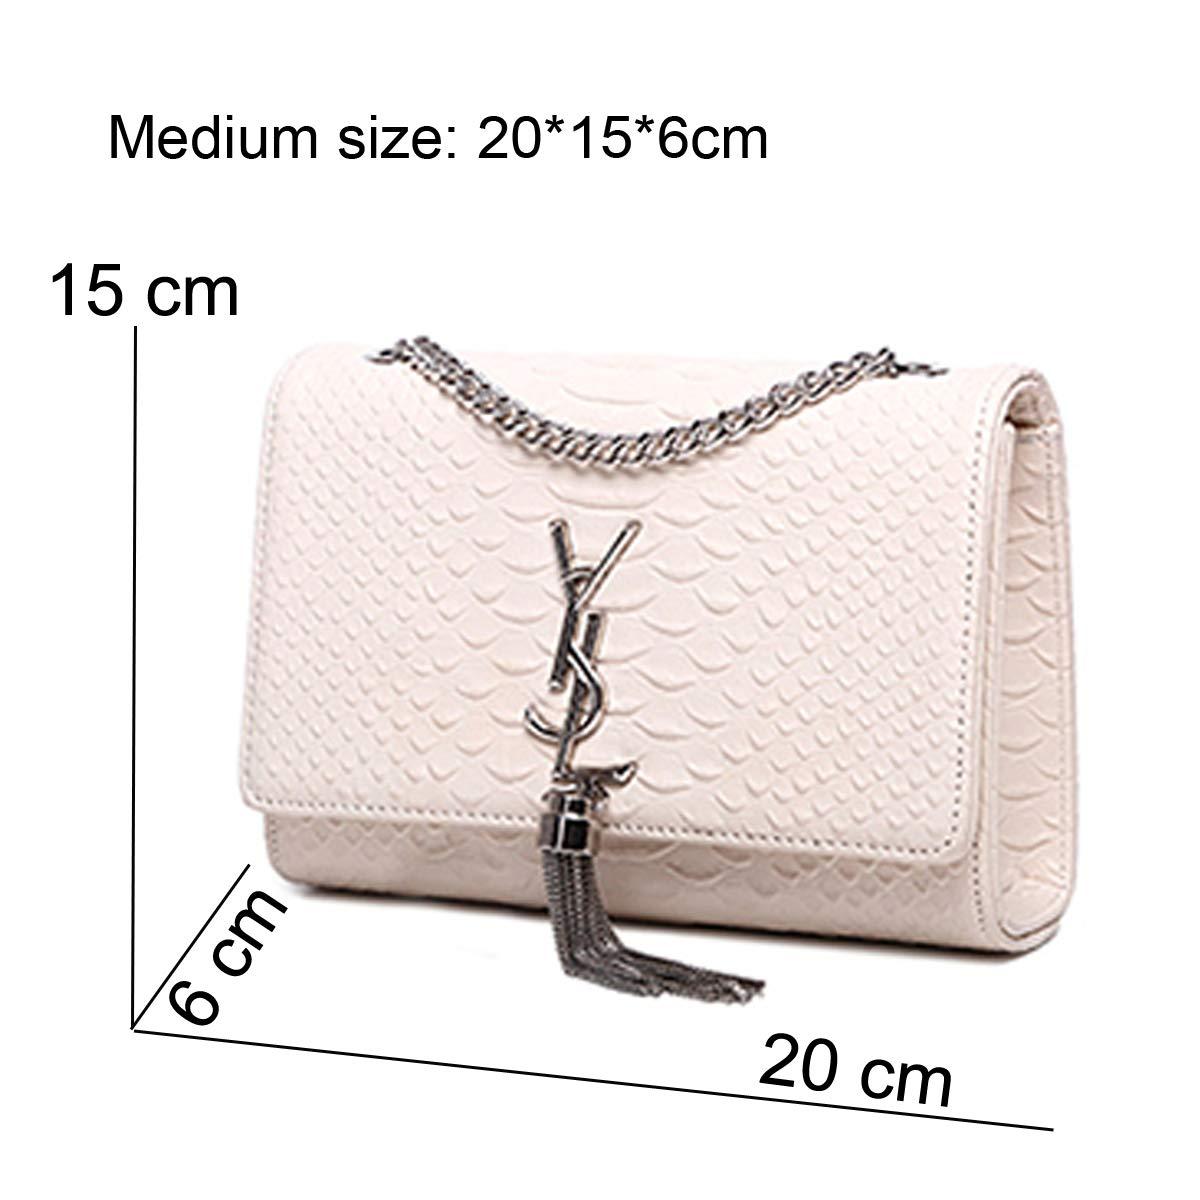 5ccec7a725 SHRJJ 2018 Fashion One Shoulder Crossbody Bags High Quality Leather  Shoulder Bag Large Capacity Room Baby Diaper Bag for Women (Medium -20   15    6CM